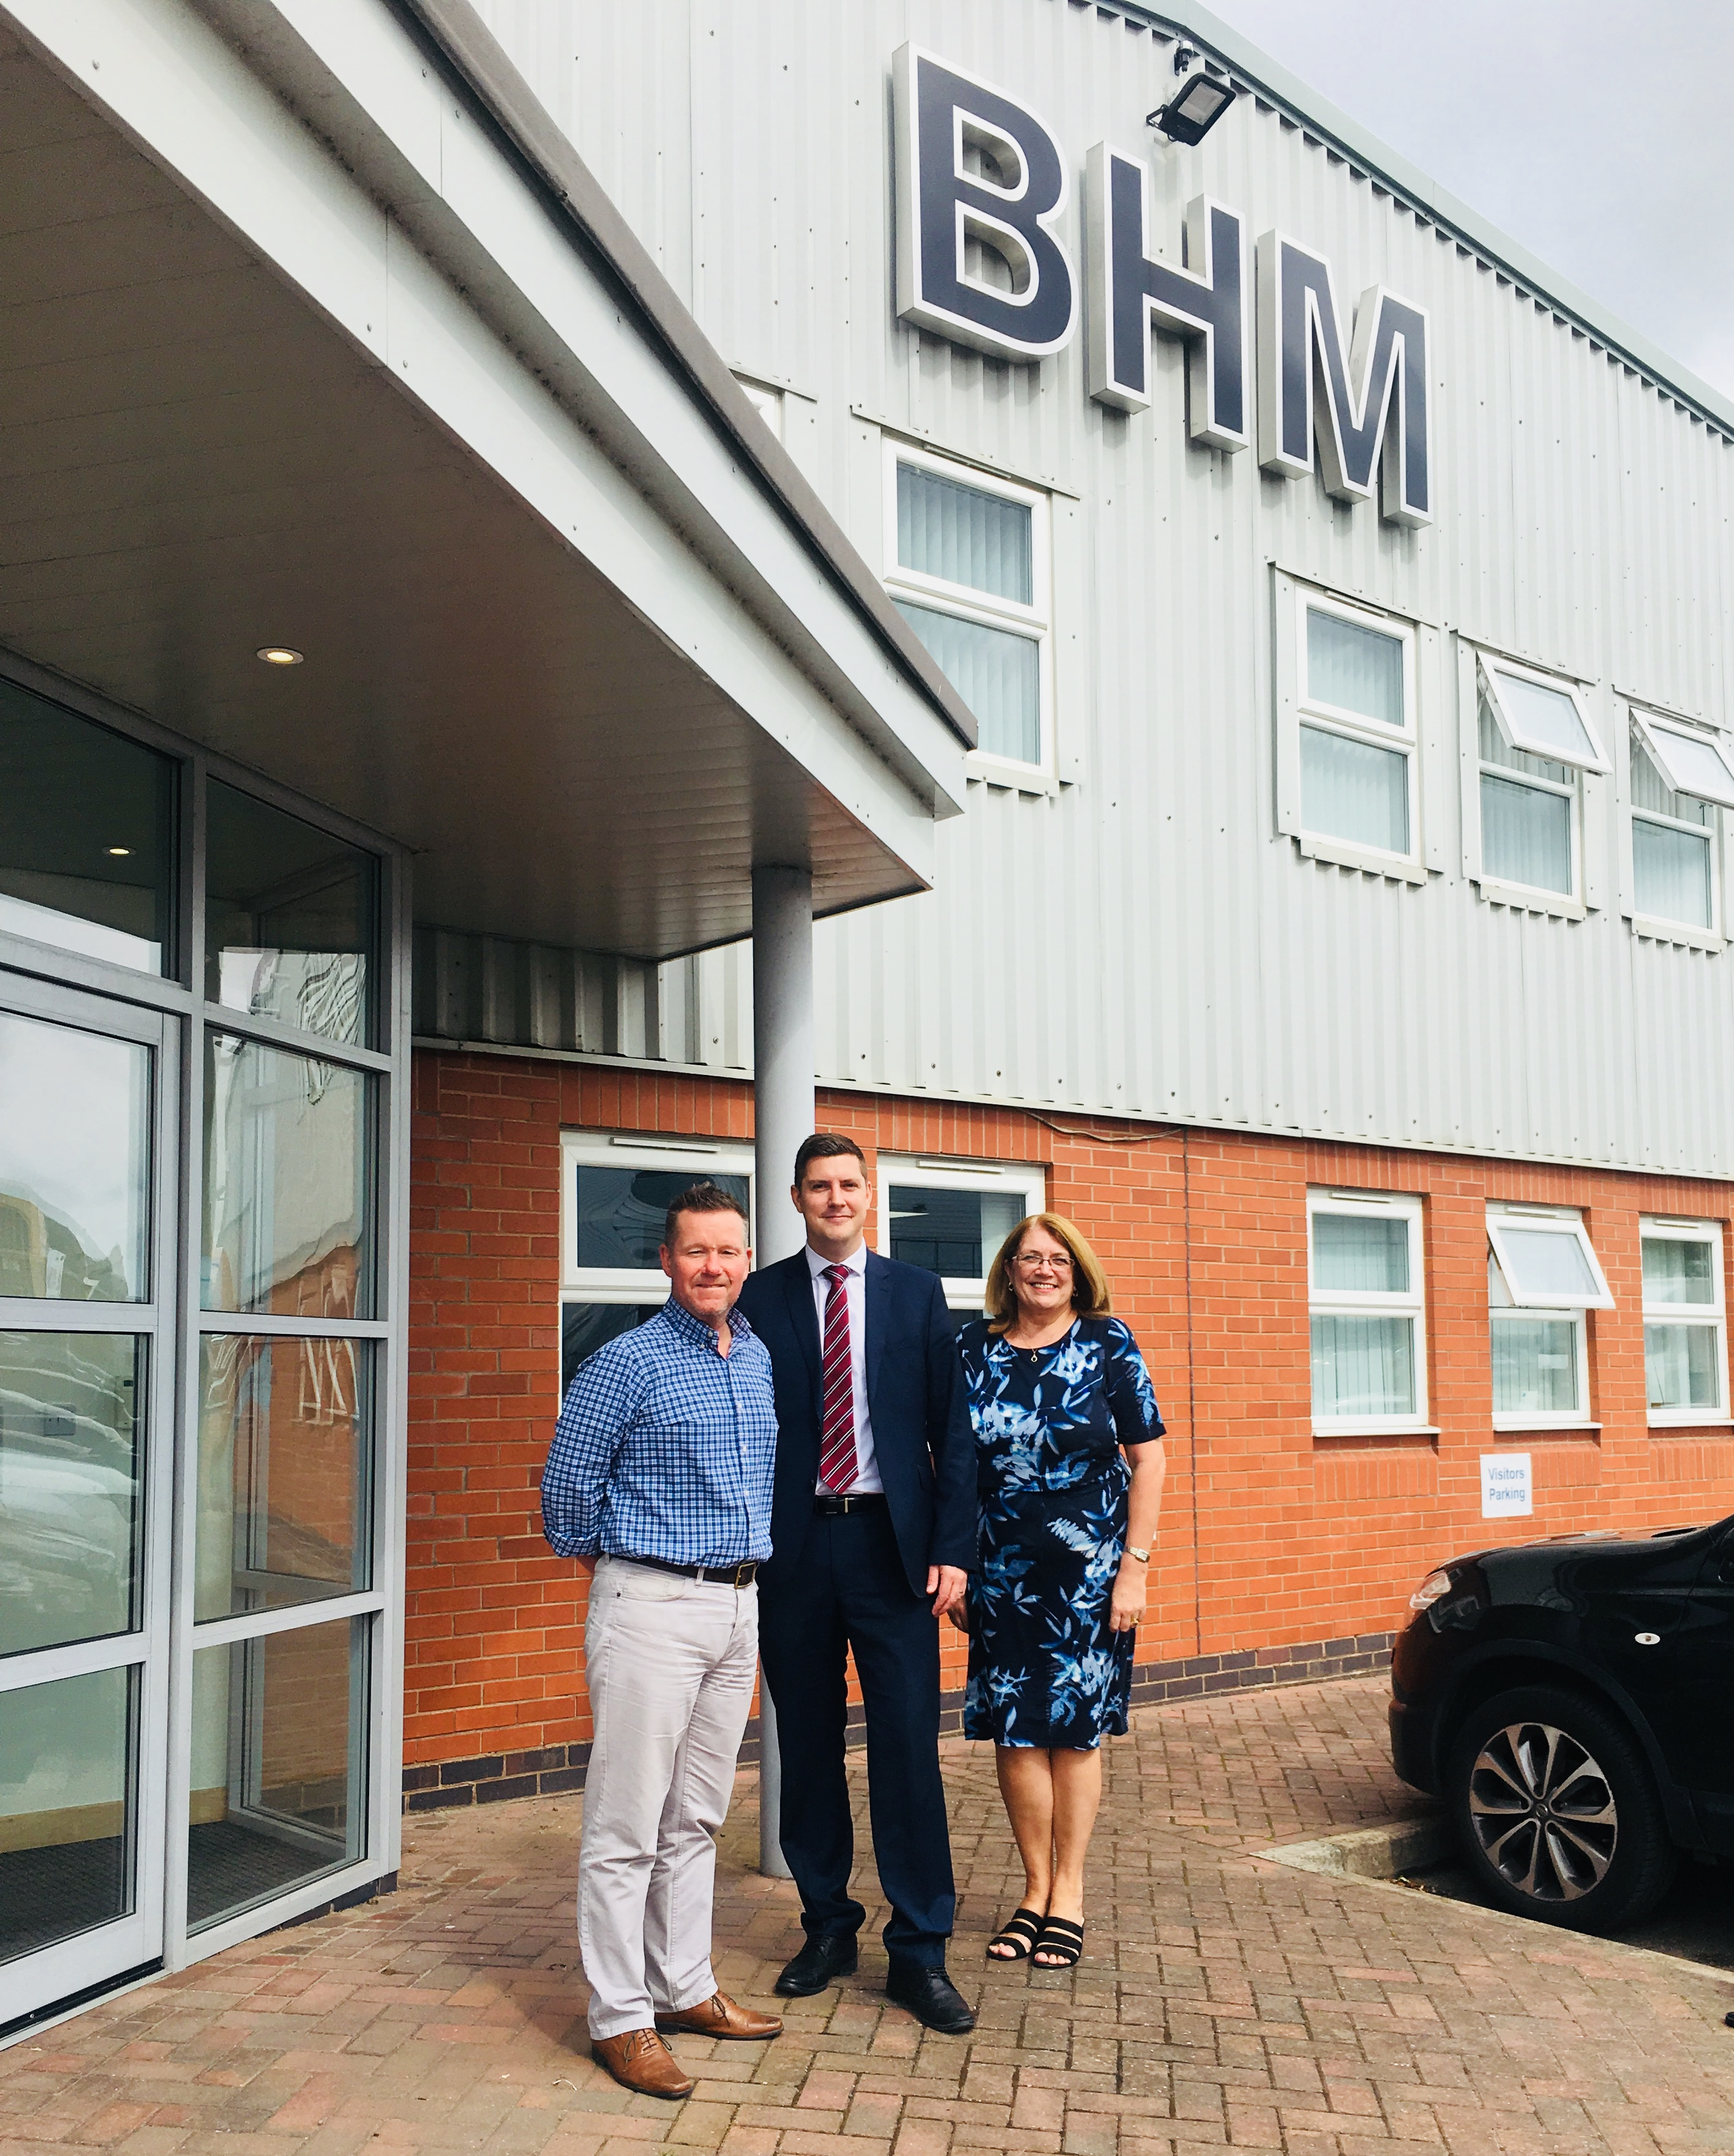 Leicestershire wholesaler set to expand internationally